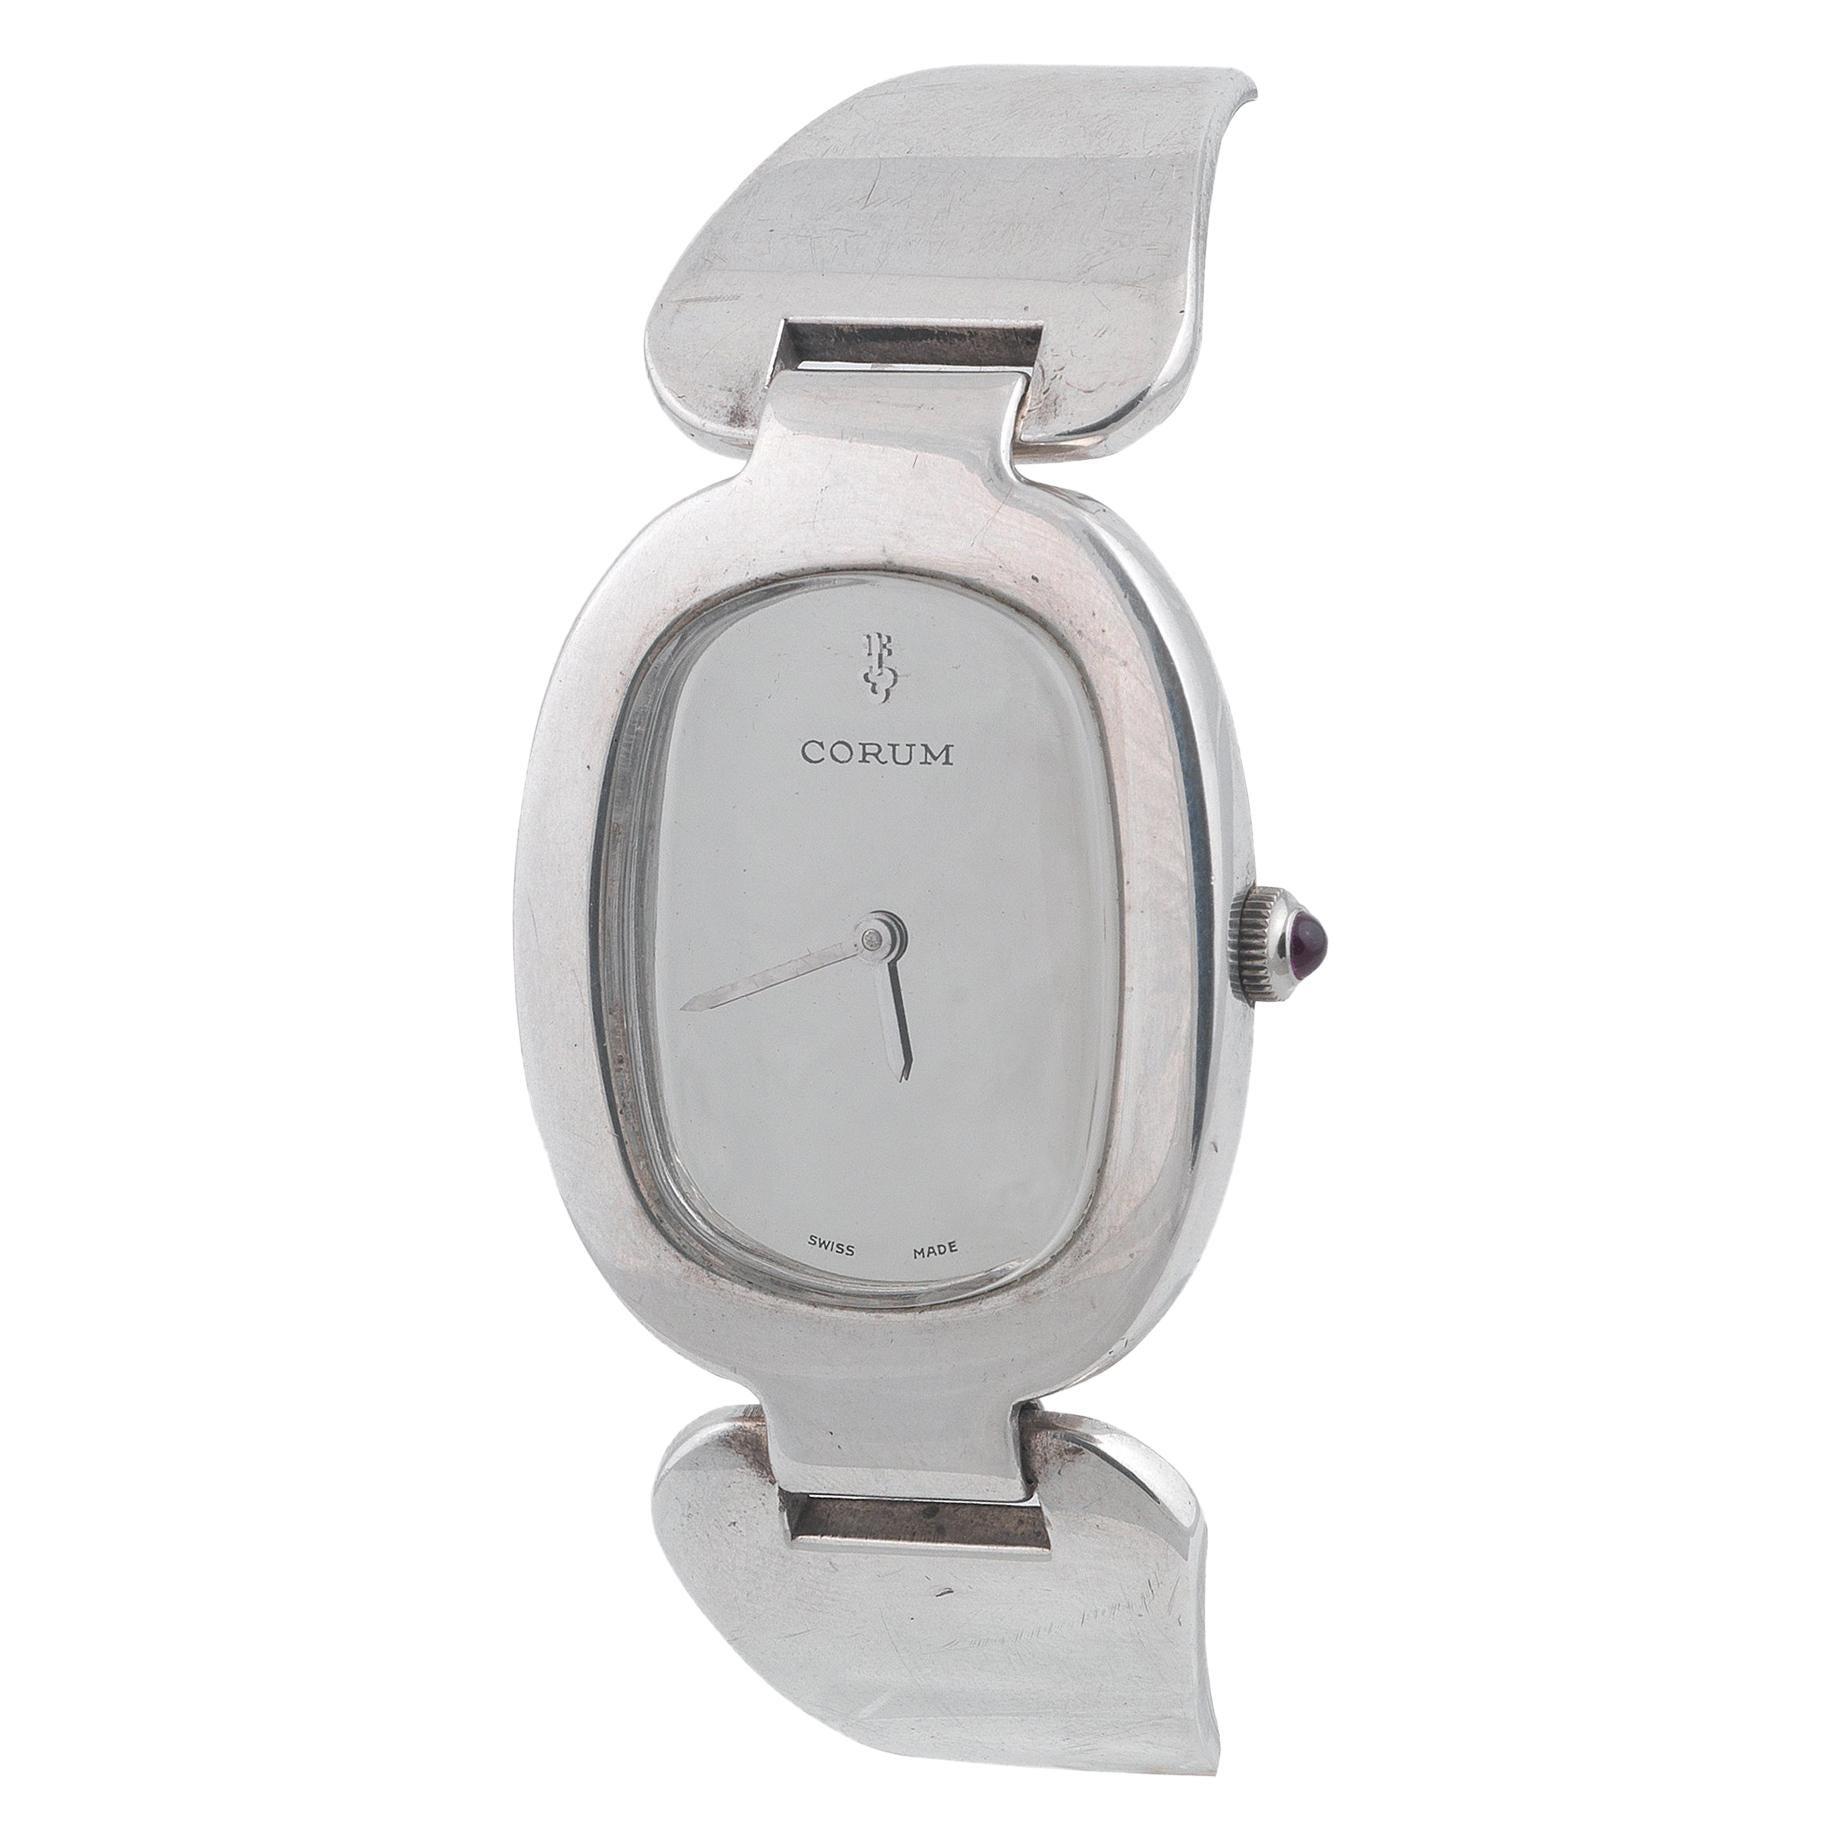 Corum Love Bond Ladies Vintage Bangle Bracelet Watch Sterling Silver